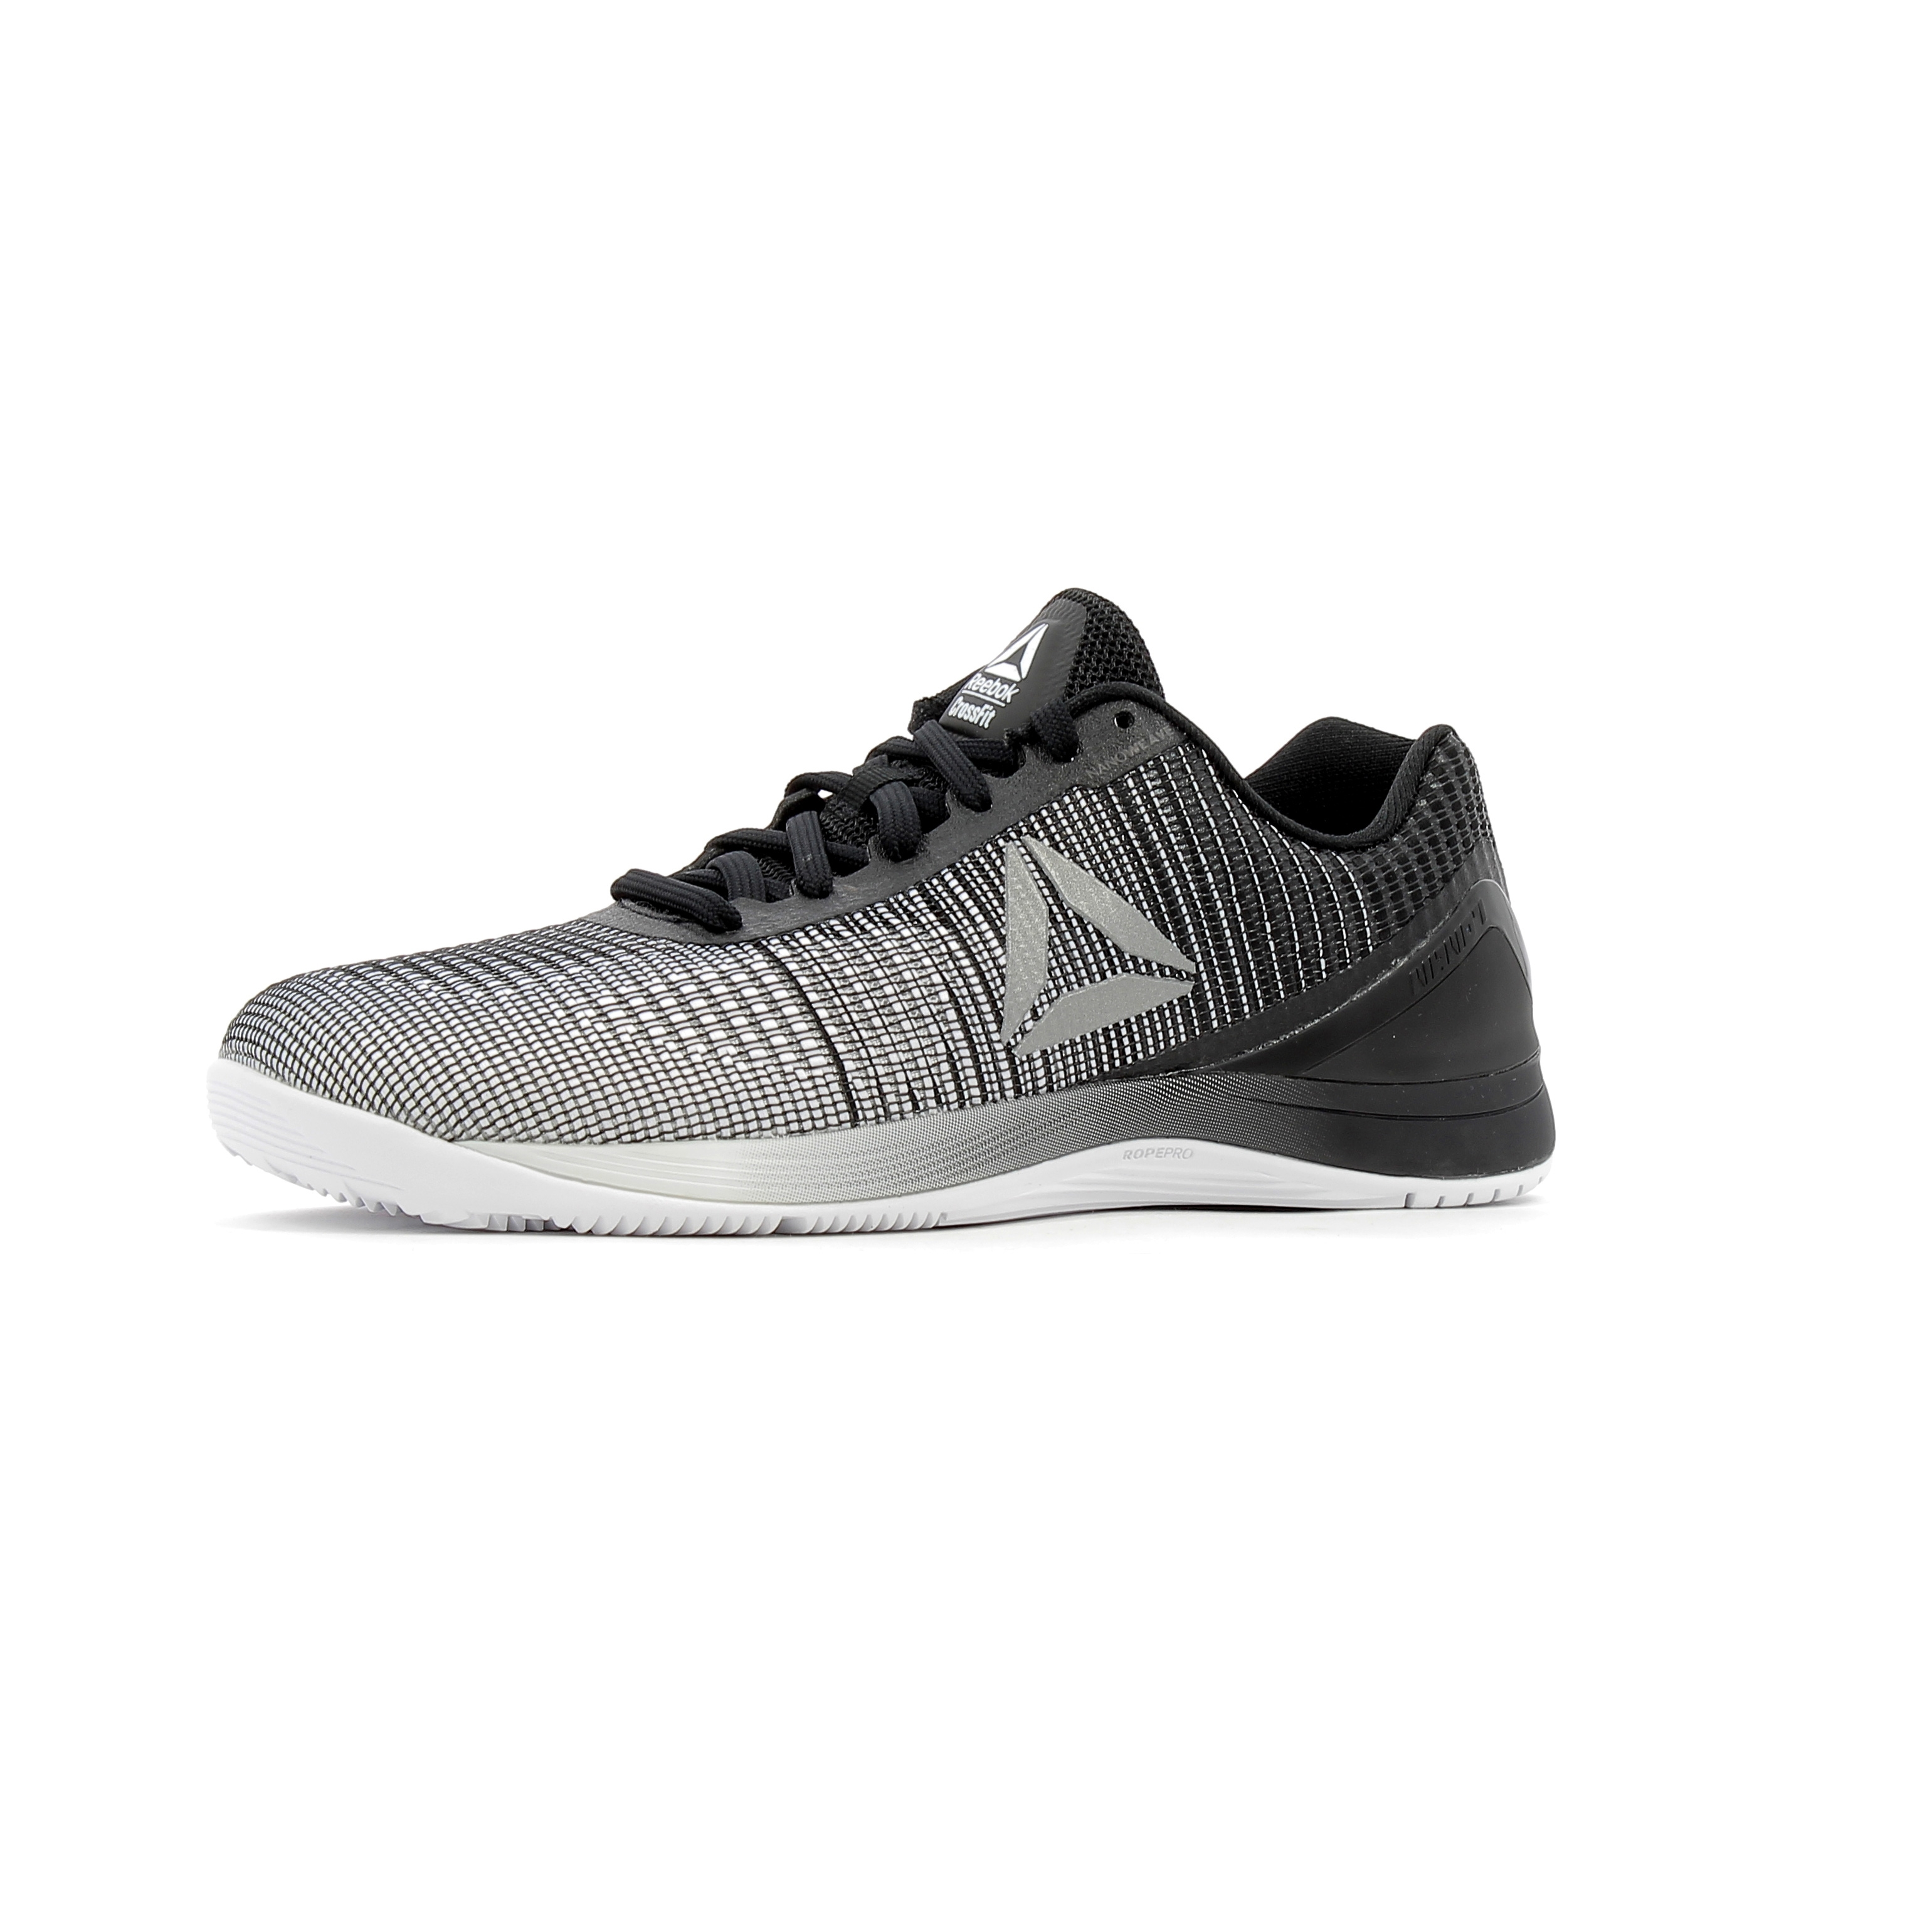 Chaussures de fitness Reebok CrossFit Nano 7 Weave